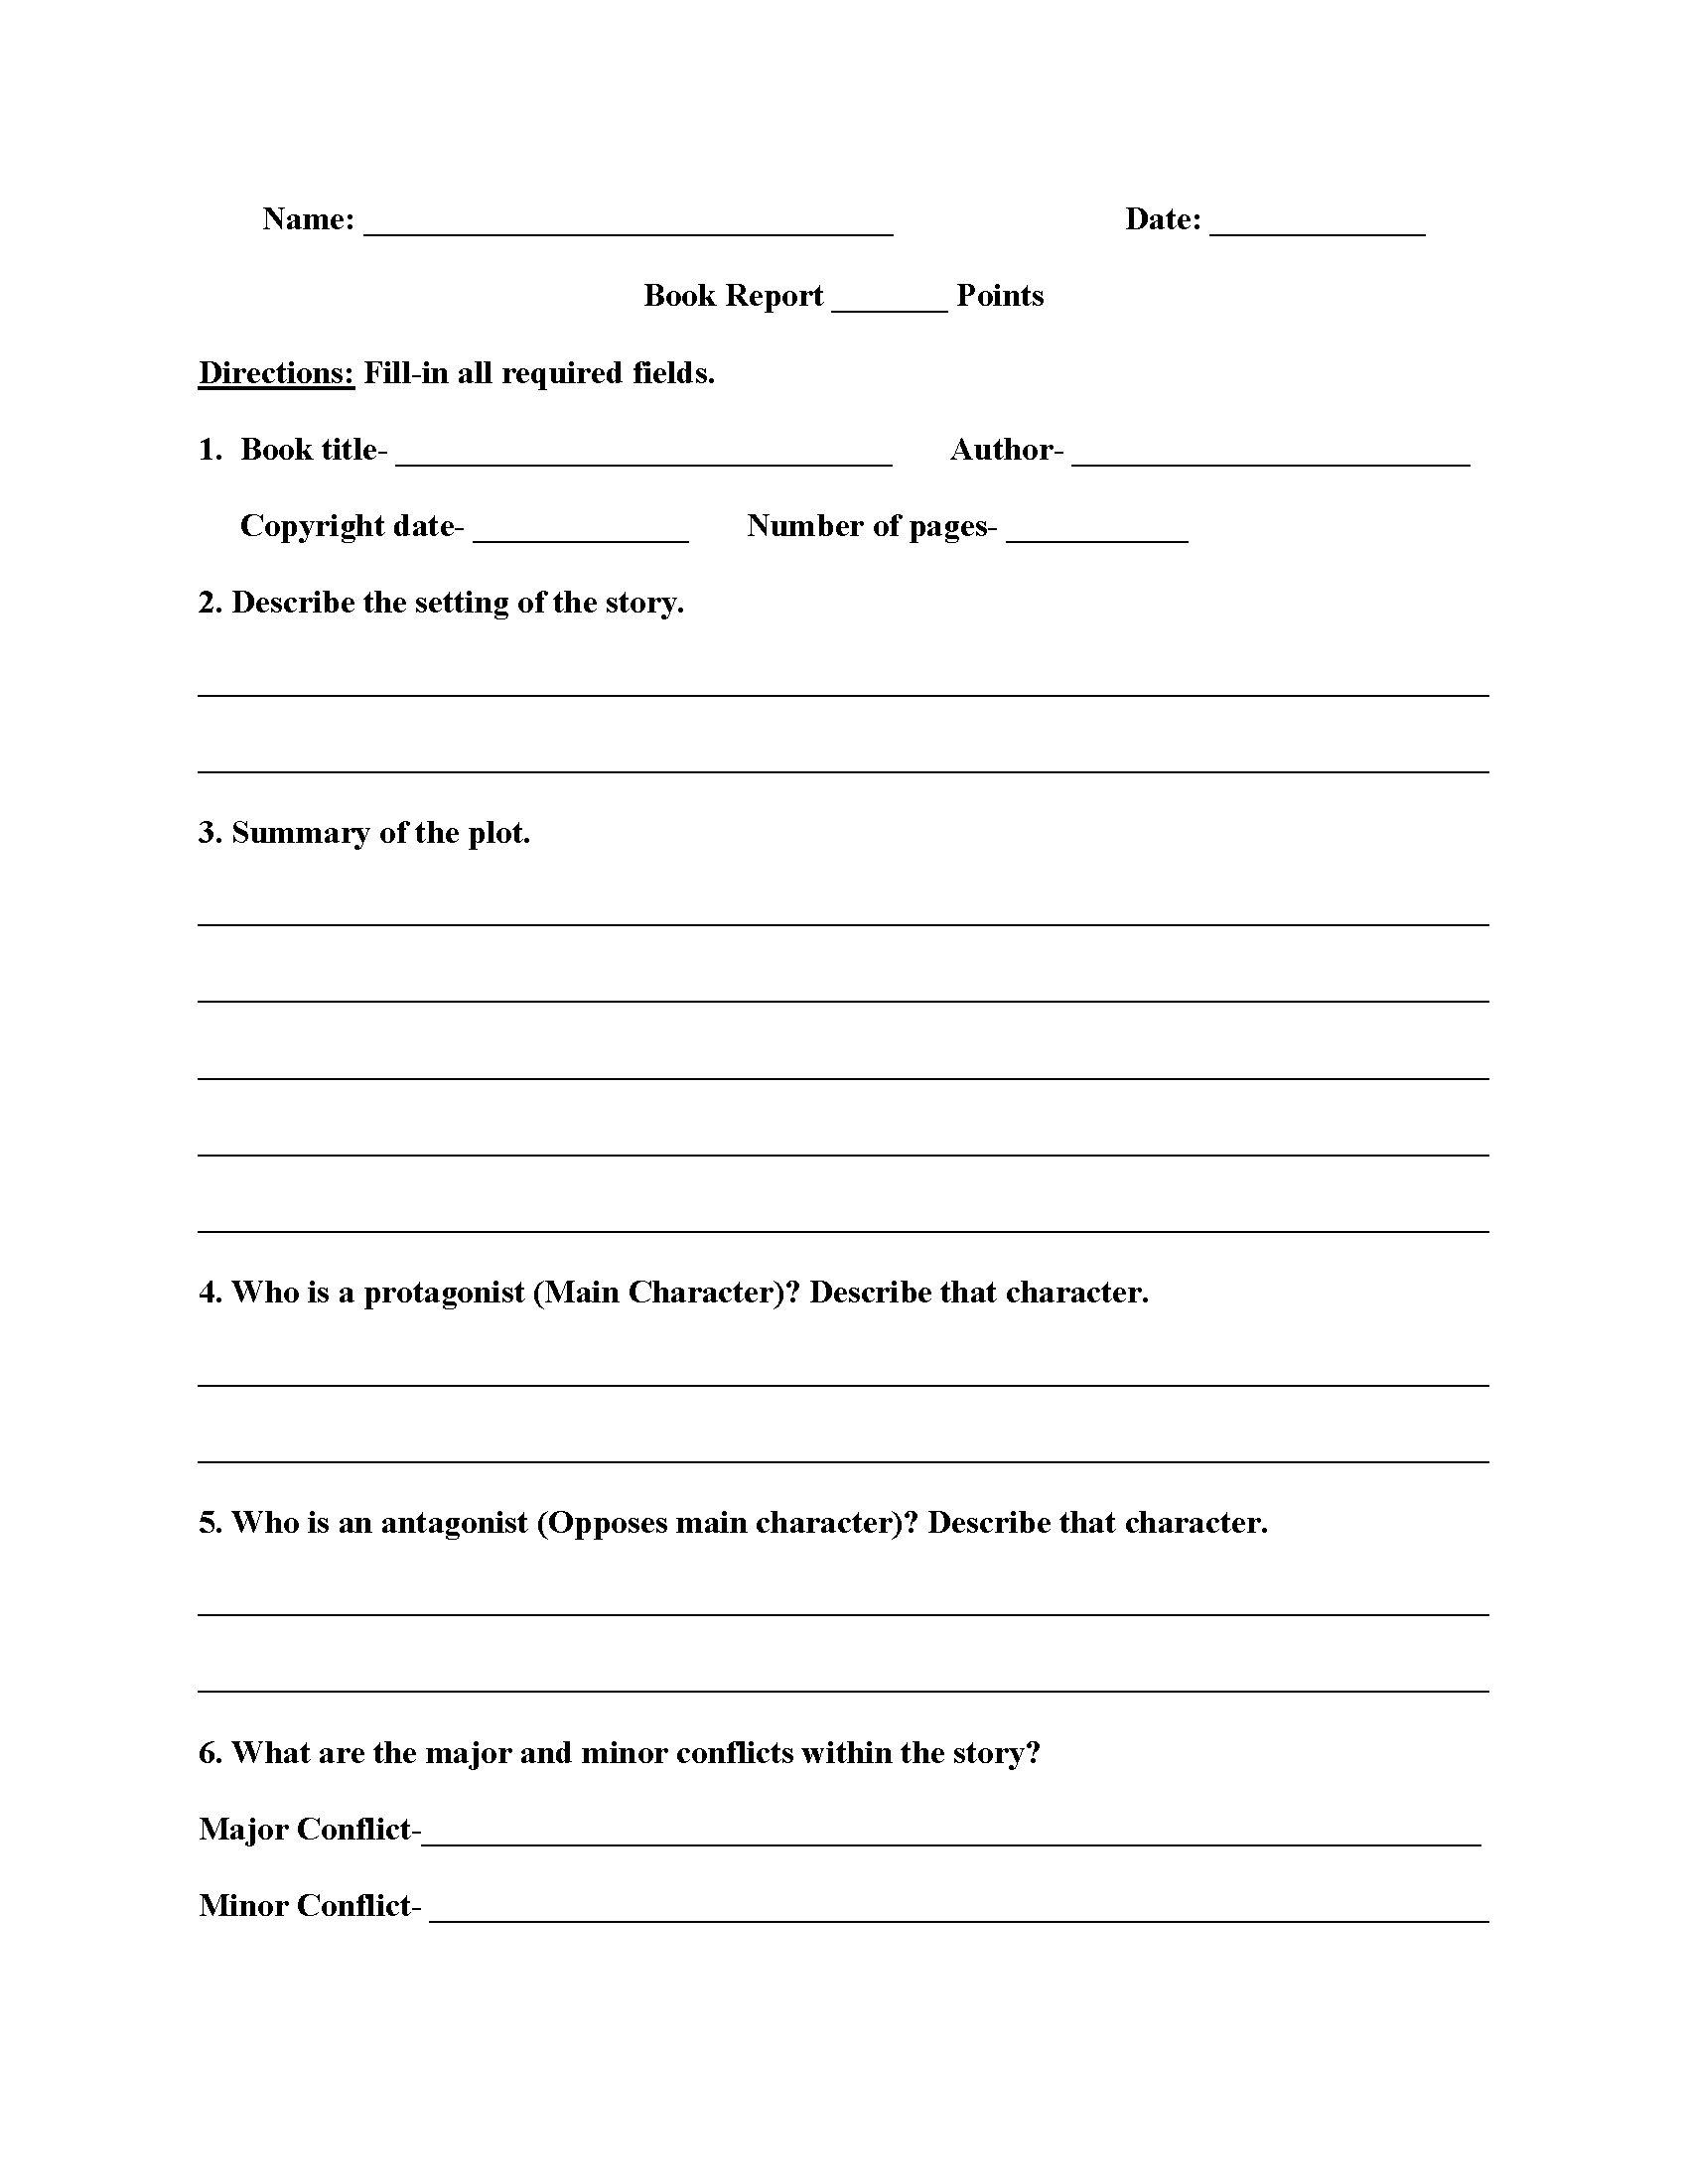 022 Template Ideas High School Book Report Free Wondrous